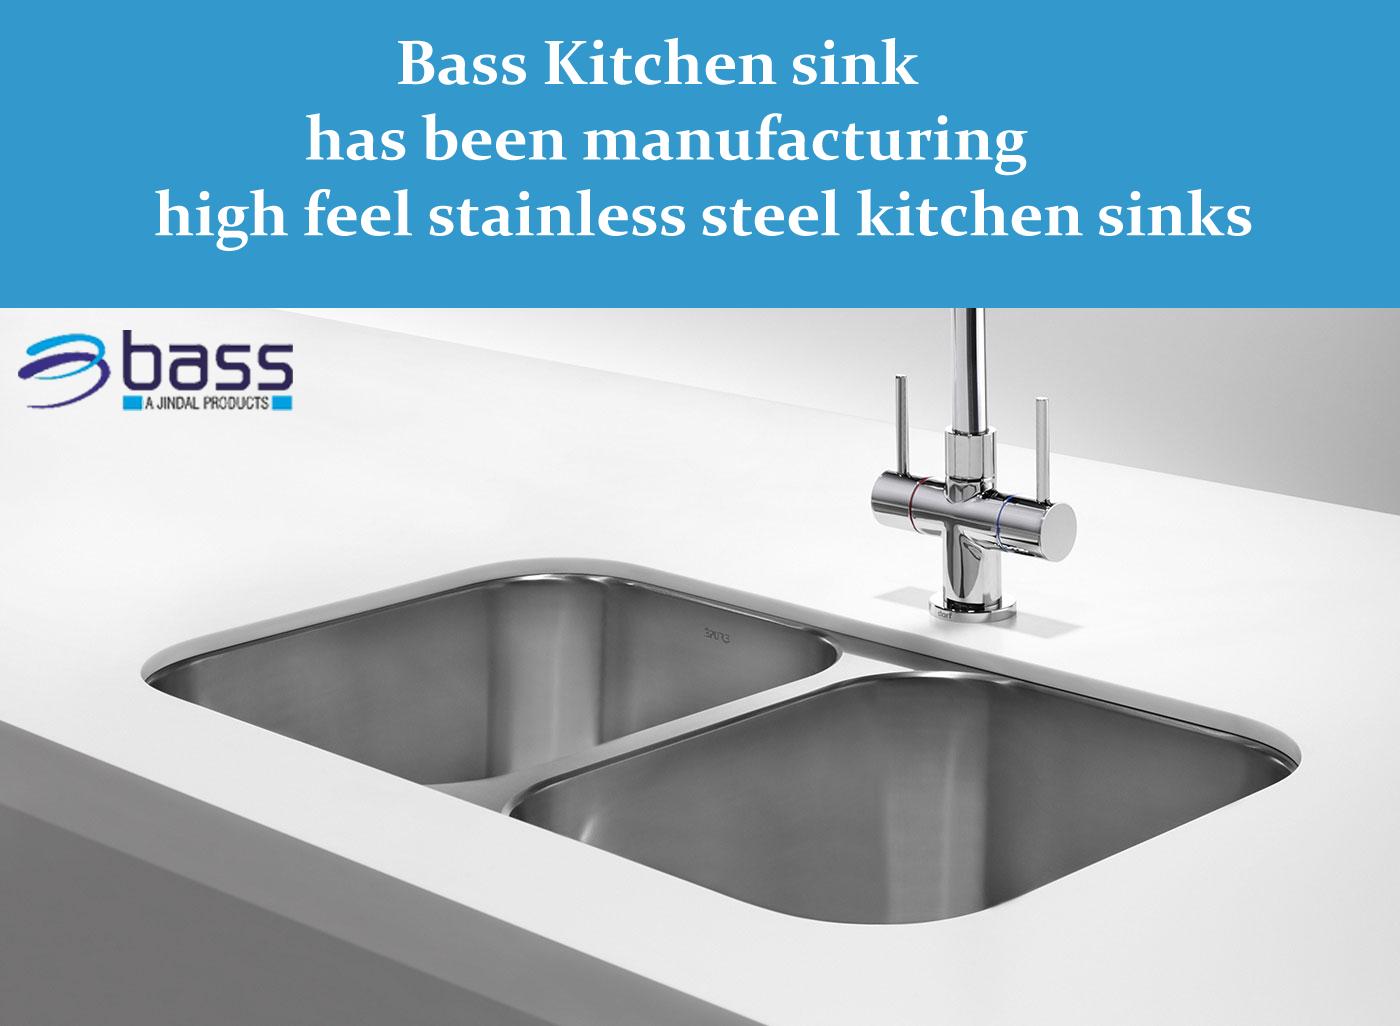 Outstanding Steel Kitchen Sink In India Amazing Stainless Steel Download Free Architecture Designs Scobabritishbridgeorg